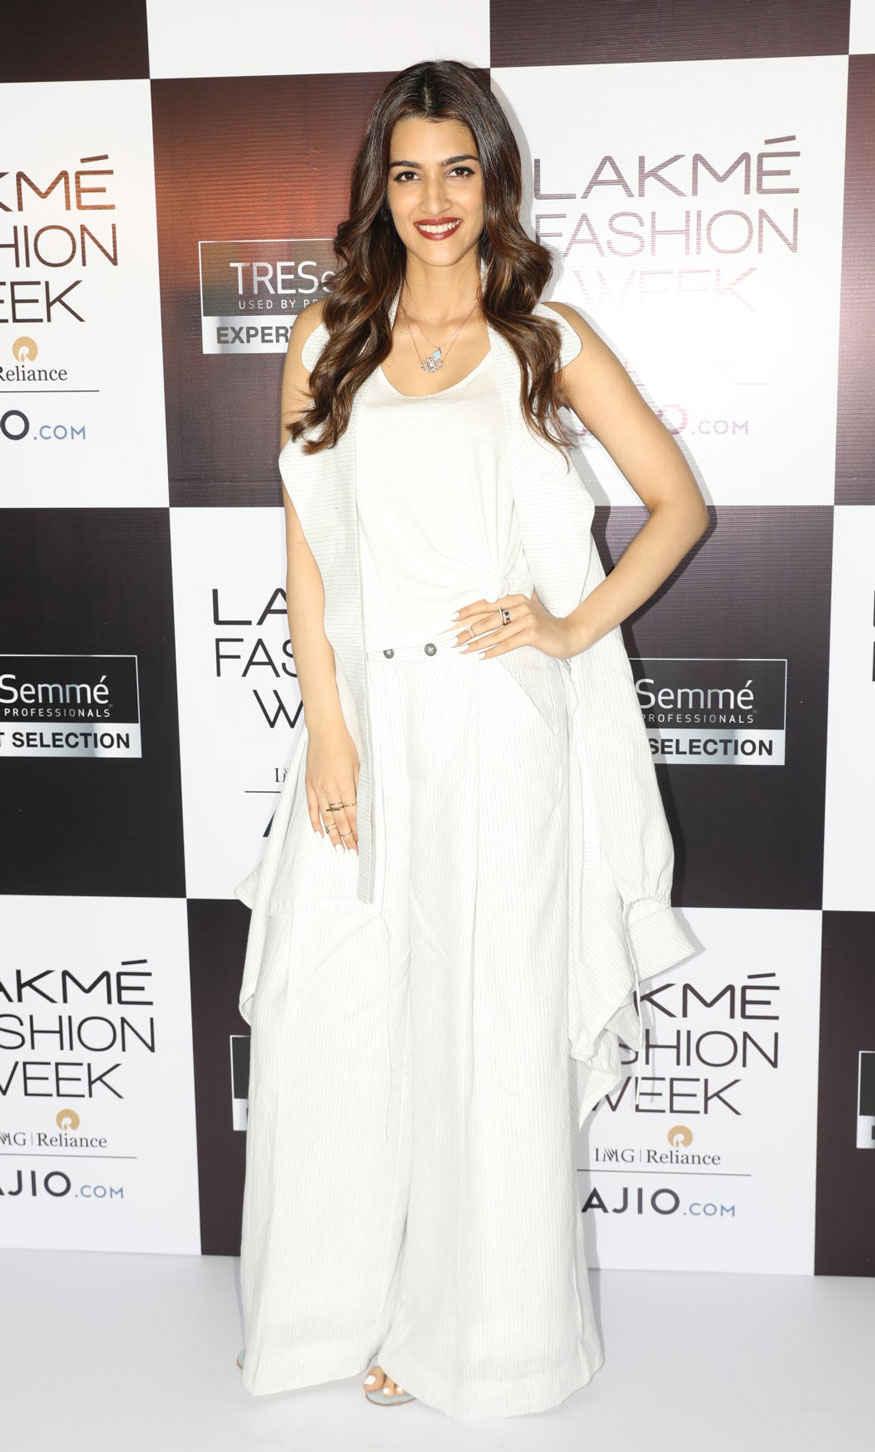 Kirti Sanon at Lakme Fashion Week Event